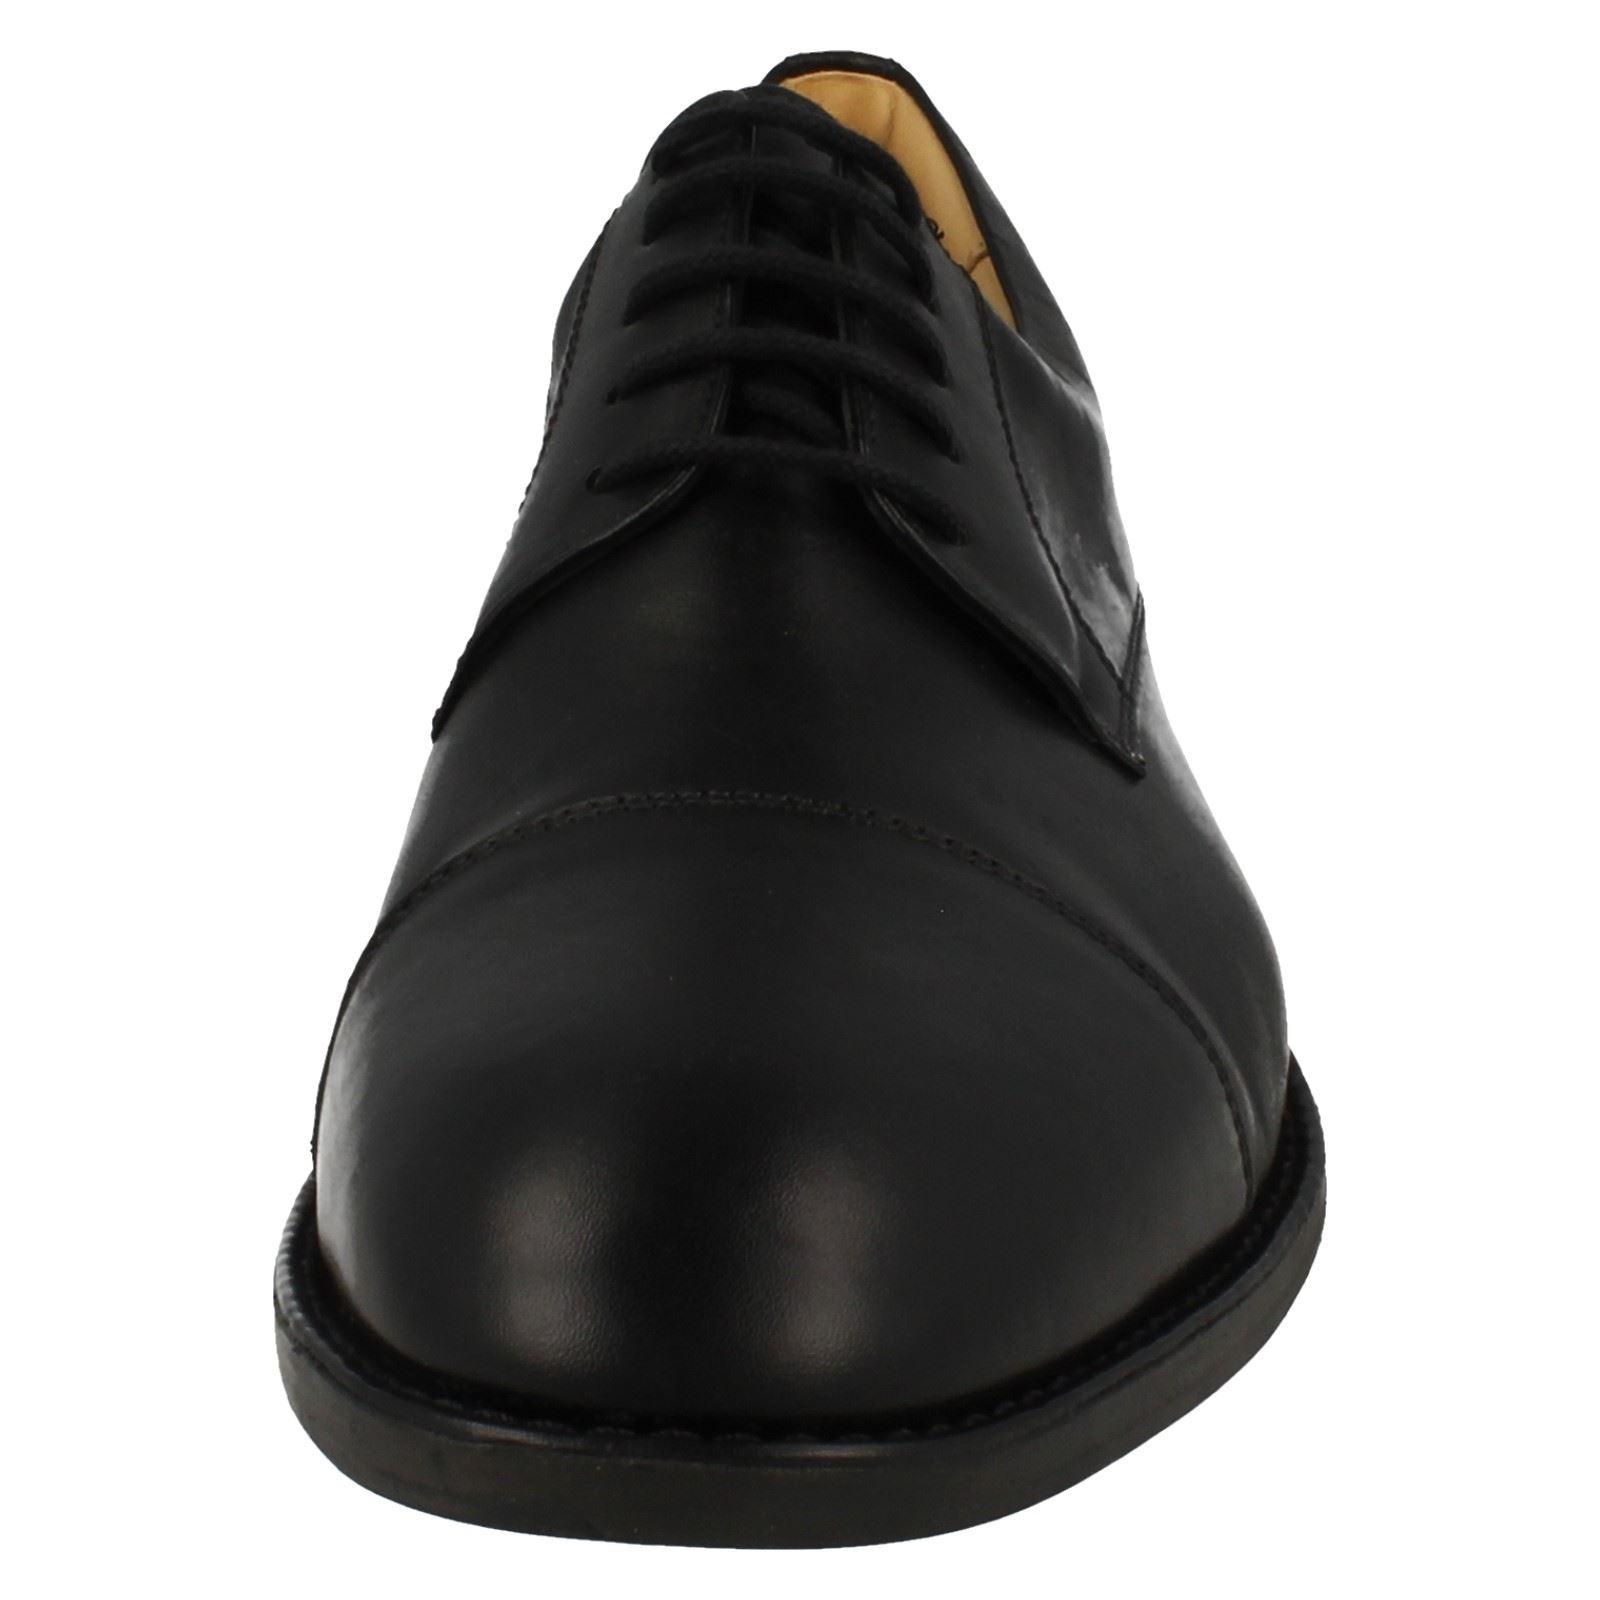 Smart Uomo Anatomic 'Itabuna' Smart  Leder Schuhes  K b599f3